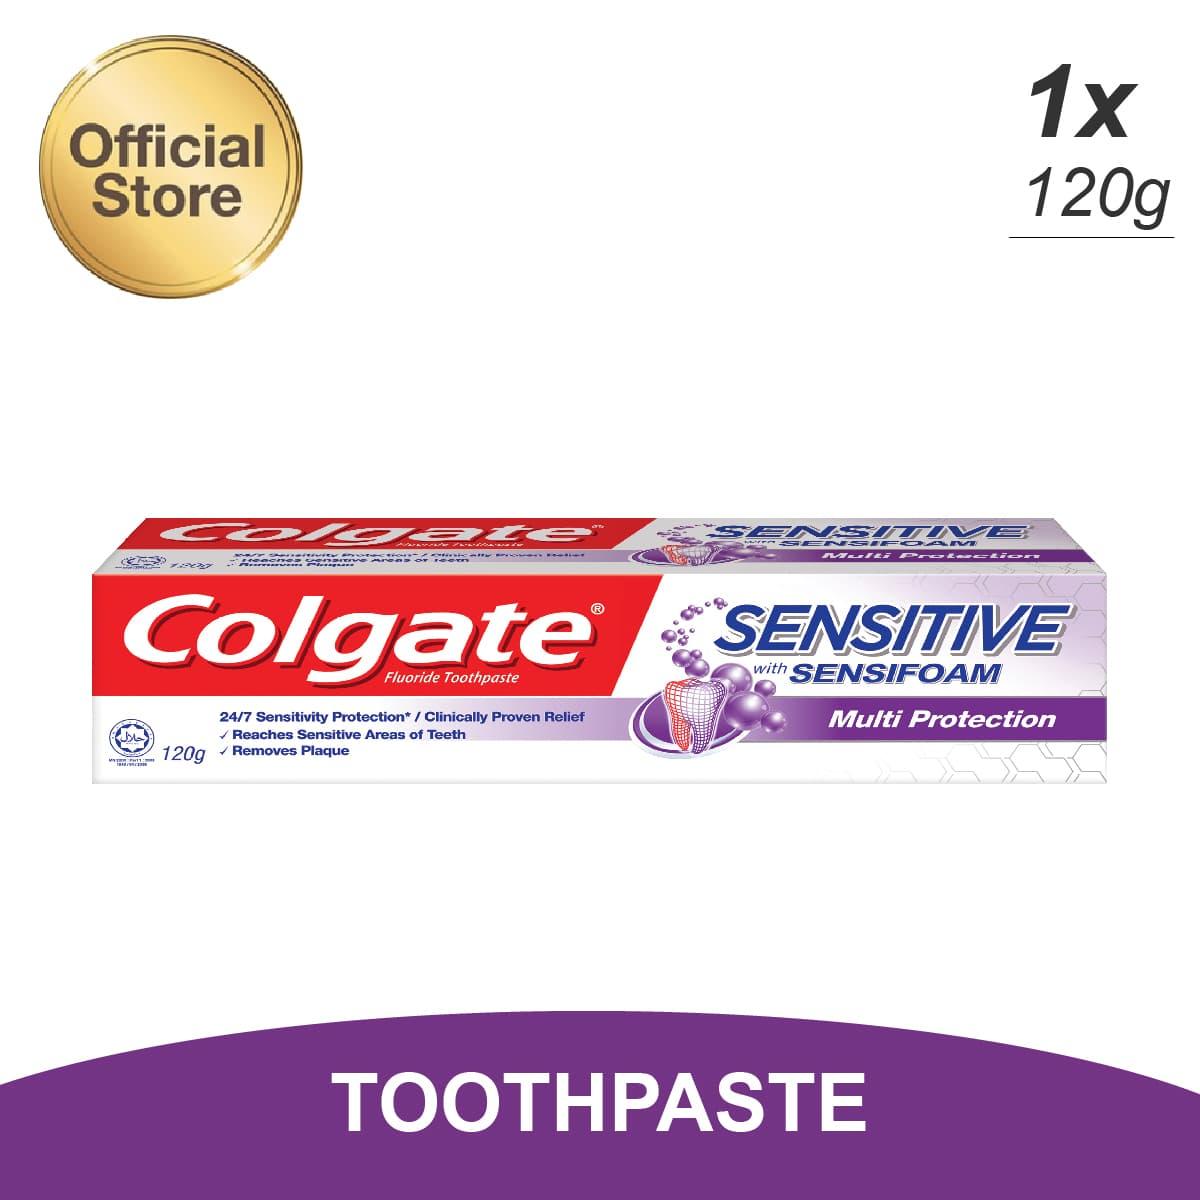 Colgate Maximum Cavity Protection Fresh Cool Mint Toothpastepasta Formula Pasta Gigi For Strong Protector Sensifoam Multiprotection Toothpaste 120g